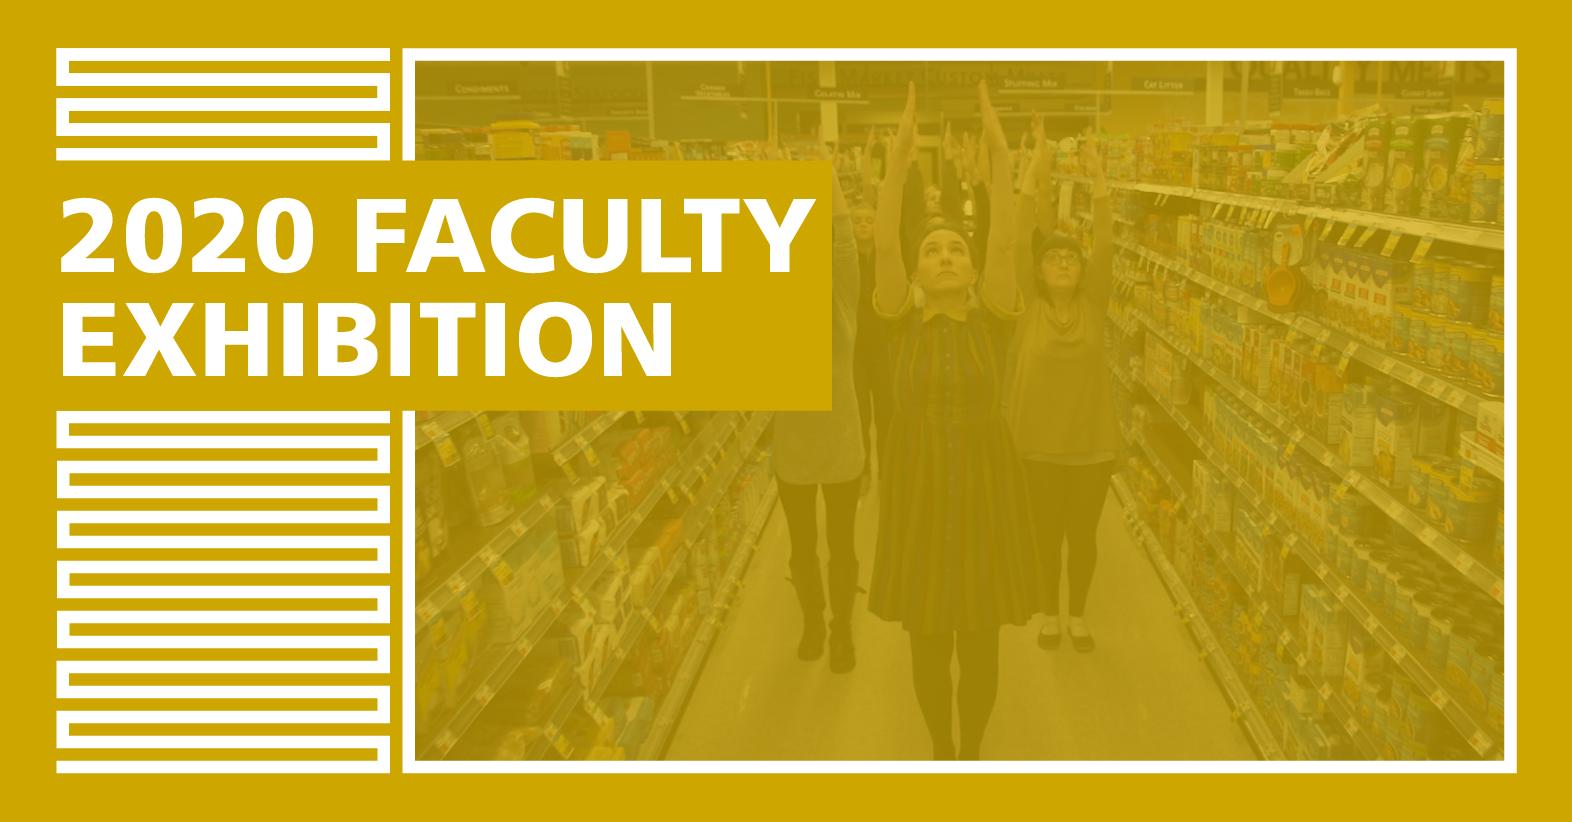 2020 Faculty Exhibition